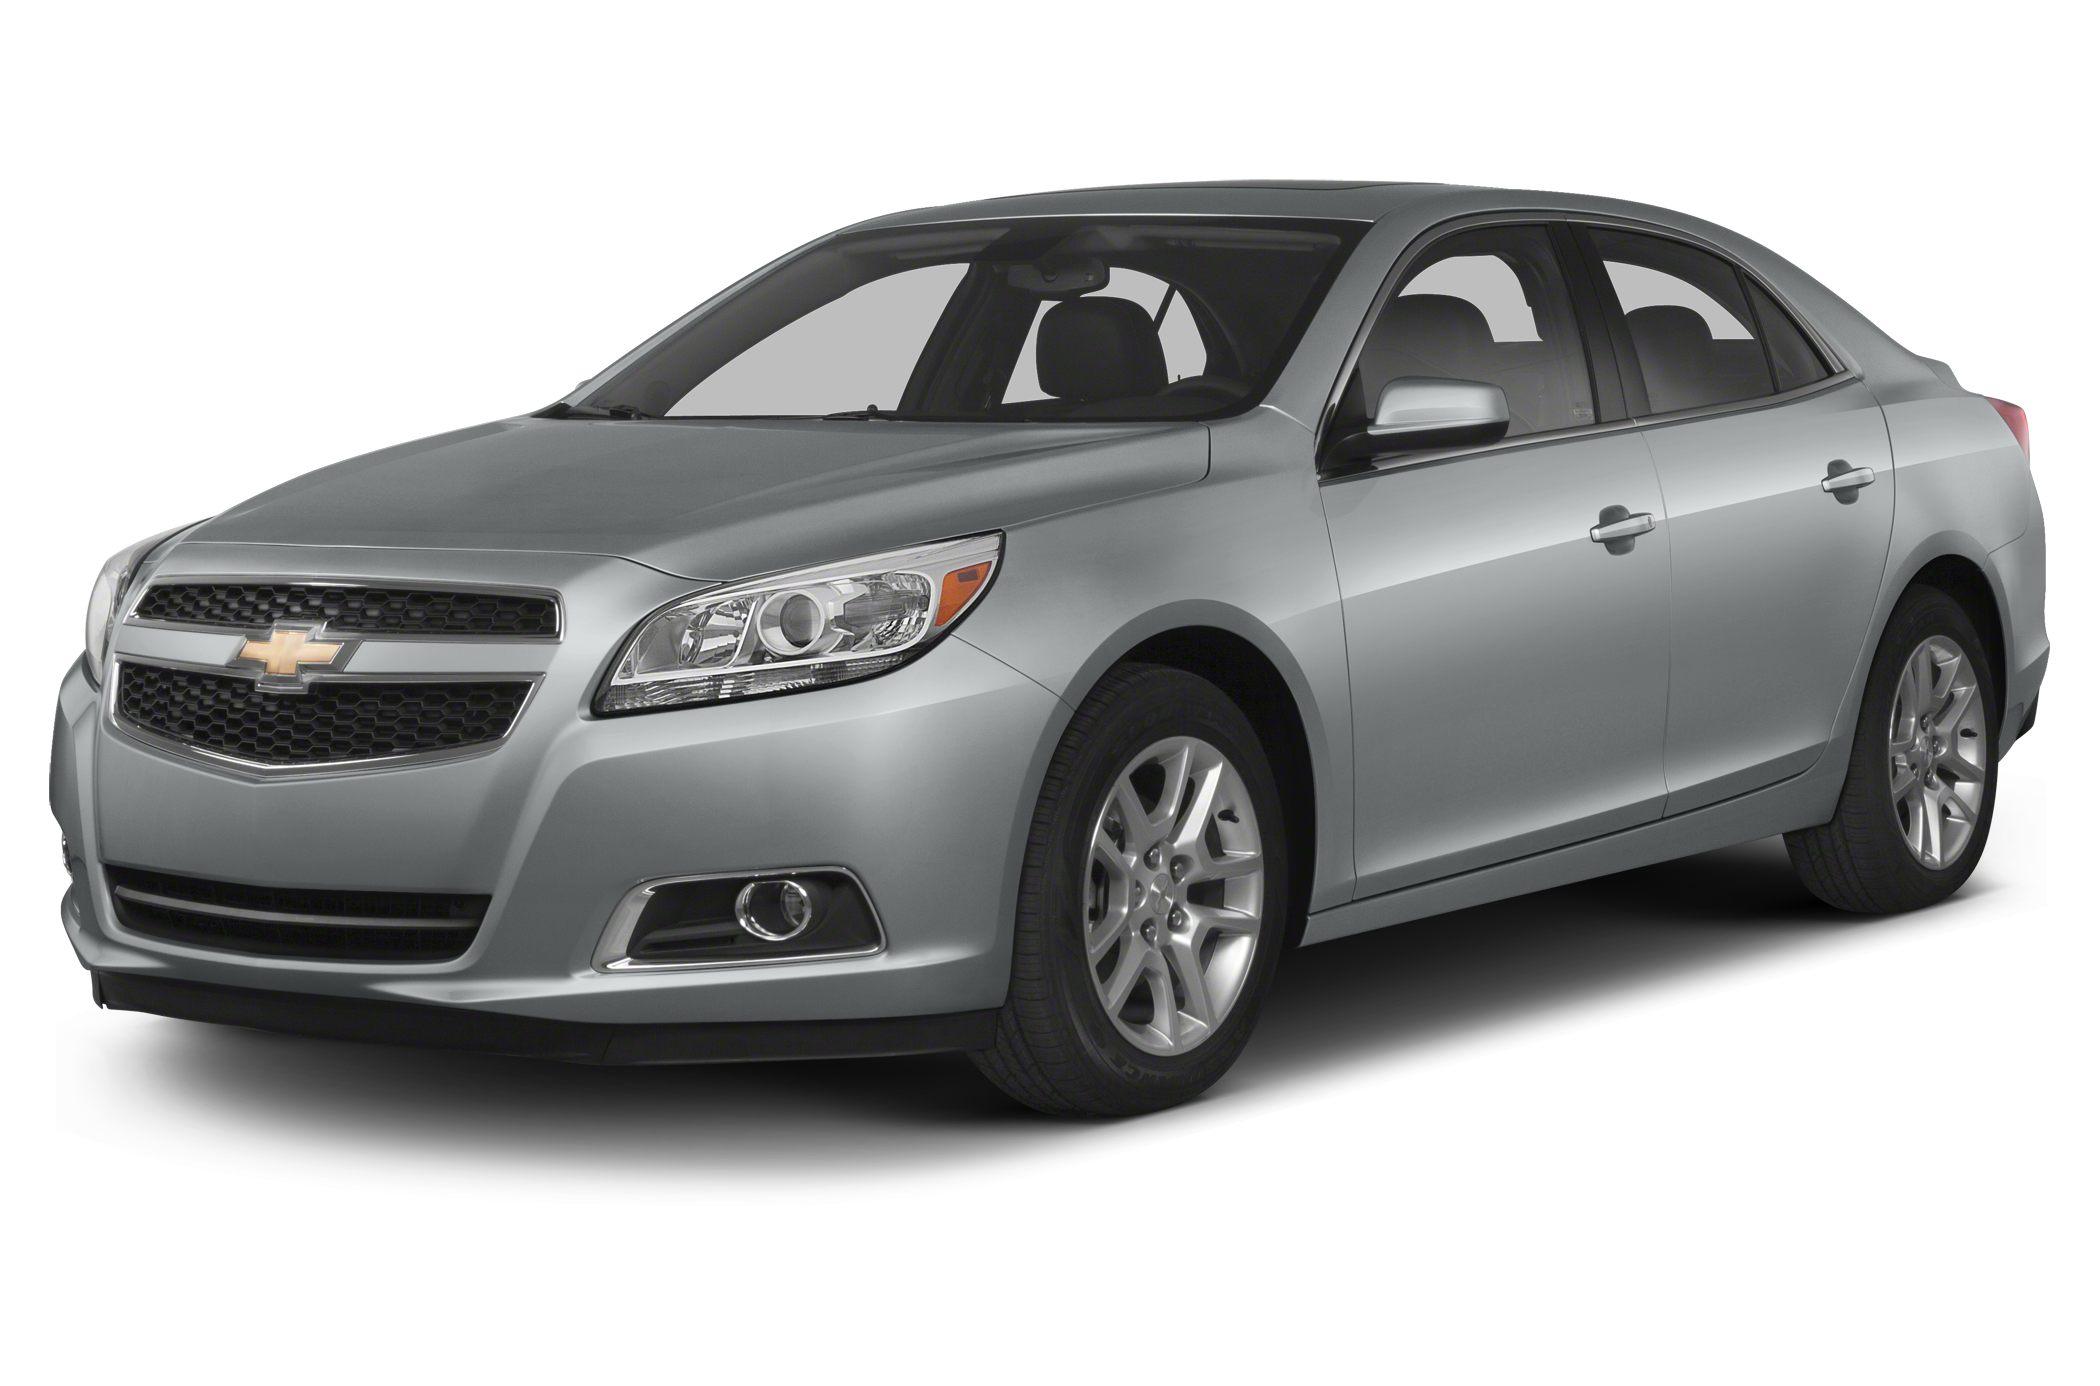 2013 Chevrolet Malibu ECO Miles 60921Color Silver Stock 18175 VIN 1G11D5SR6DF266684